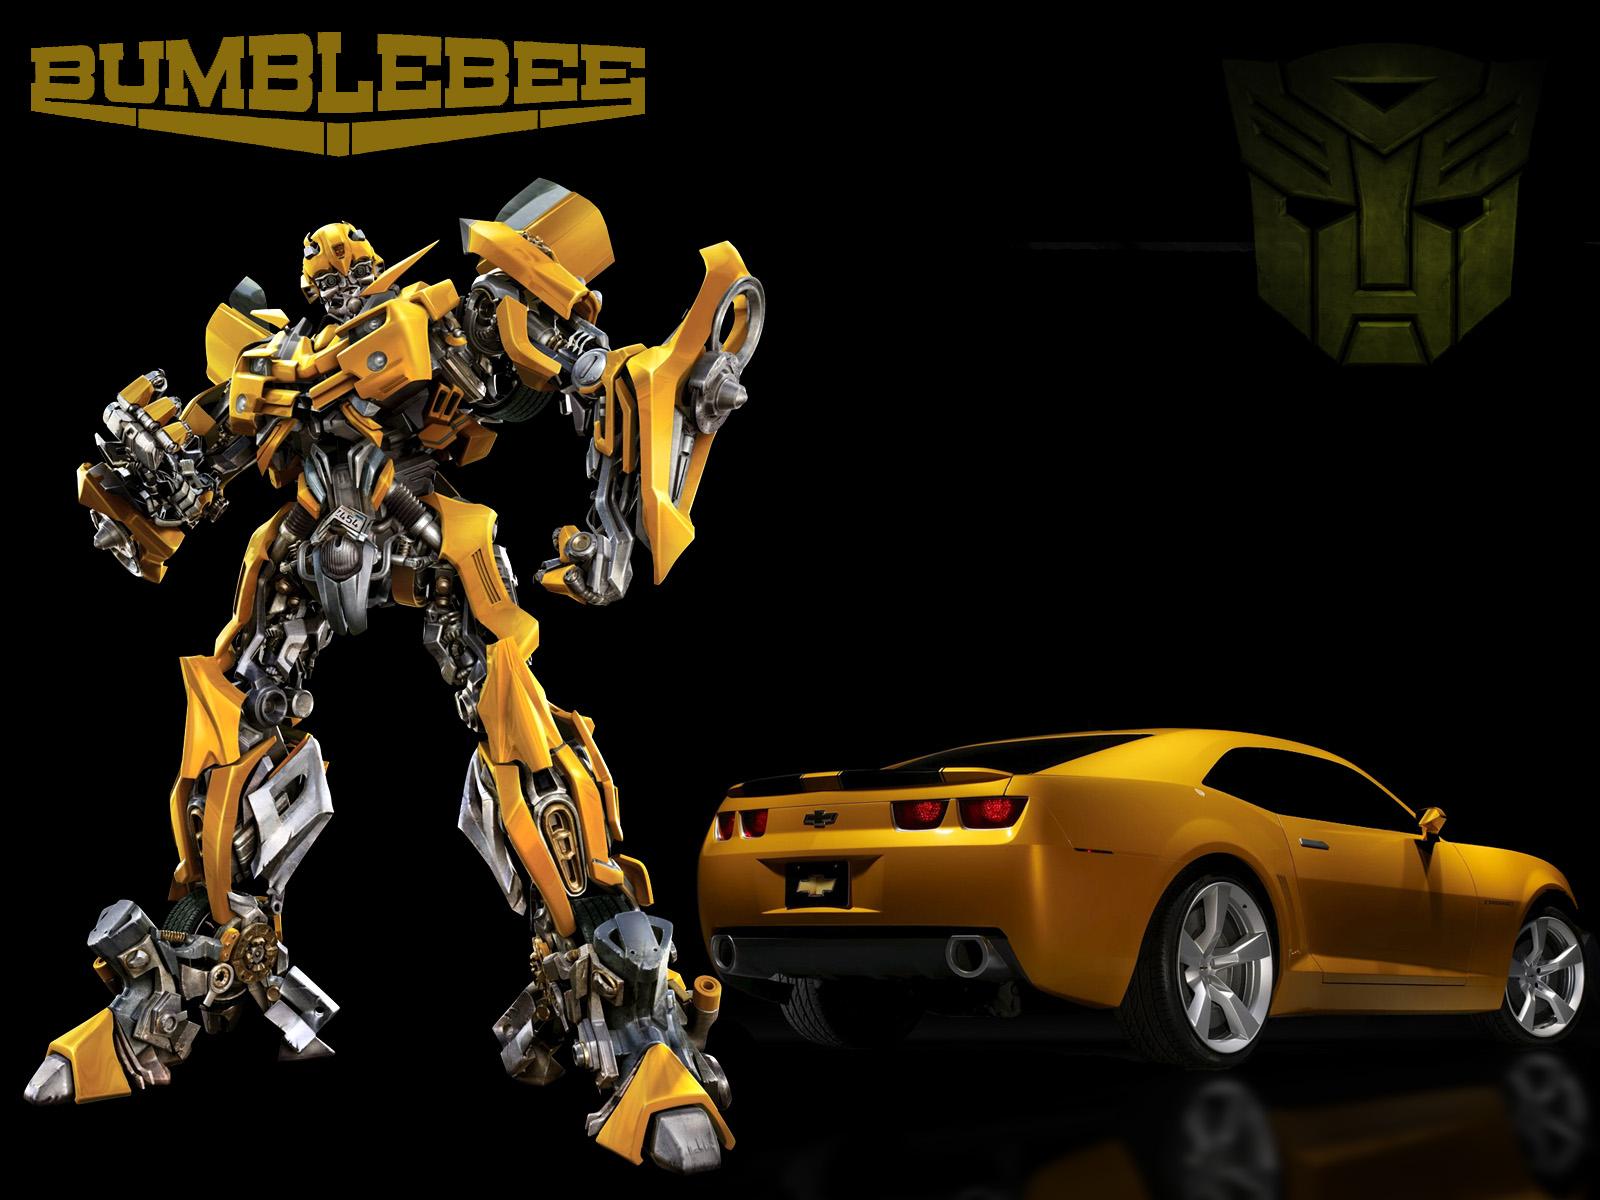 http://2.bp.blogspot.com/_rUoKS5VhJX8/TETDUYSy3fI/AAAAAAAAABg/BoS2Kh9BC1U/s1600/Transformers-transformers-627087_1600_1200.jpg